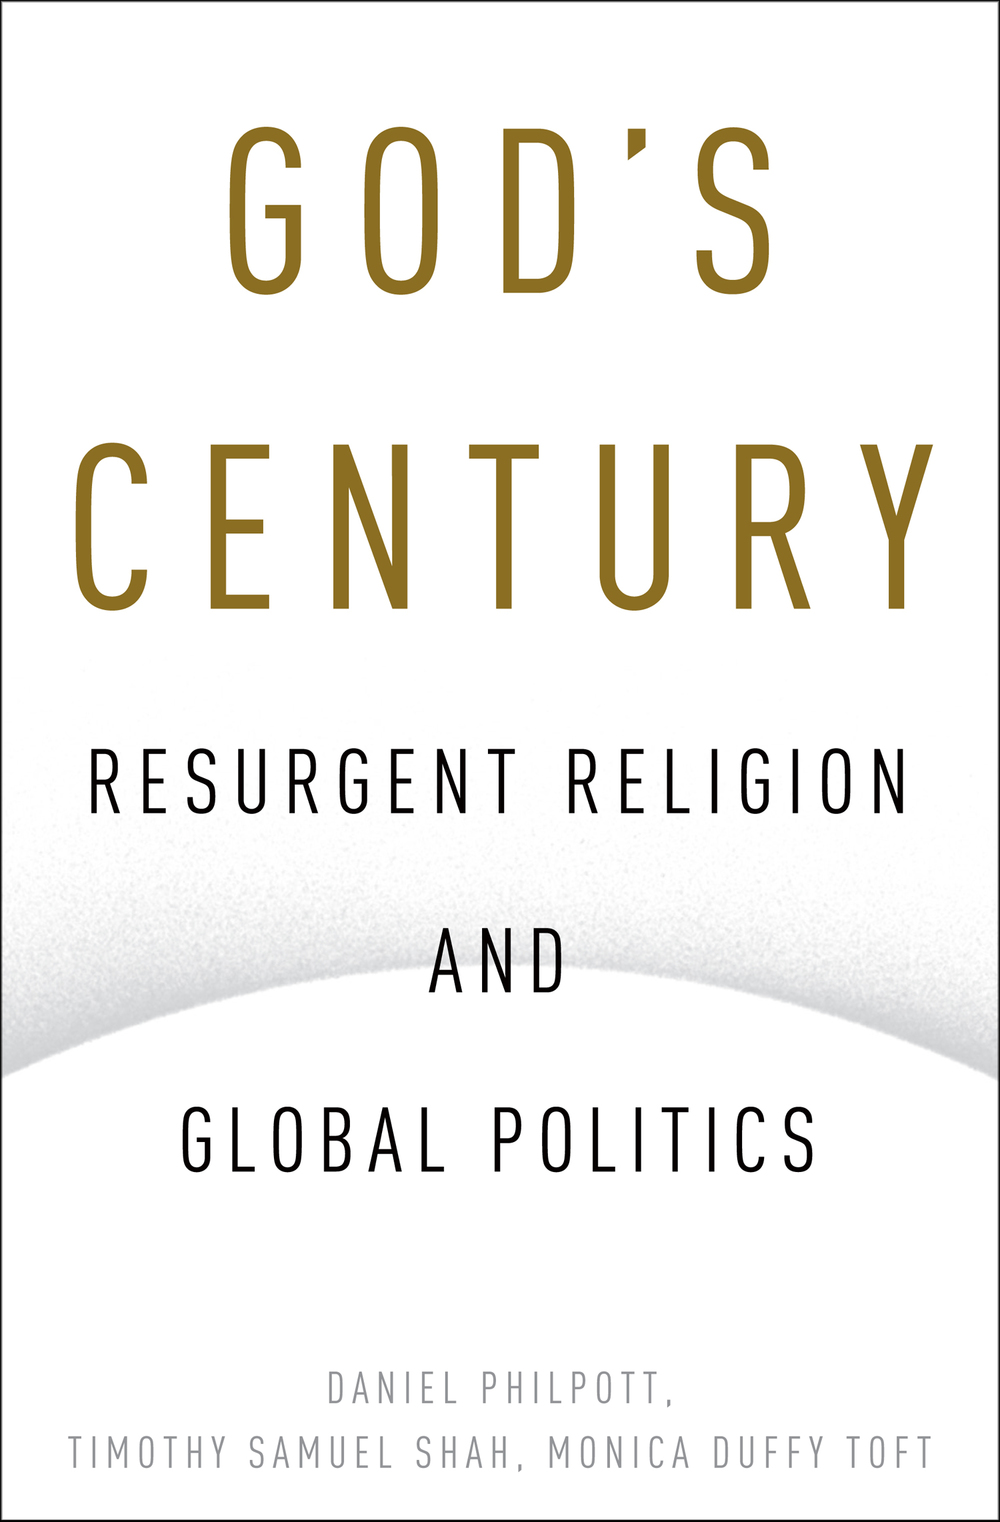 GOD'S-CENTURY-comp-ss6.jpg